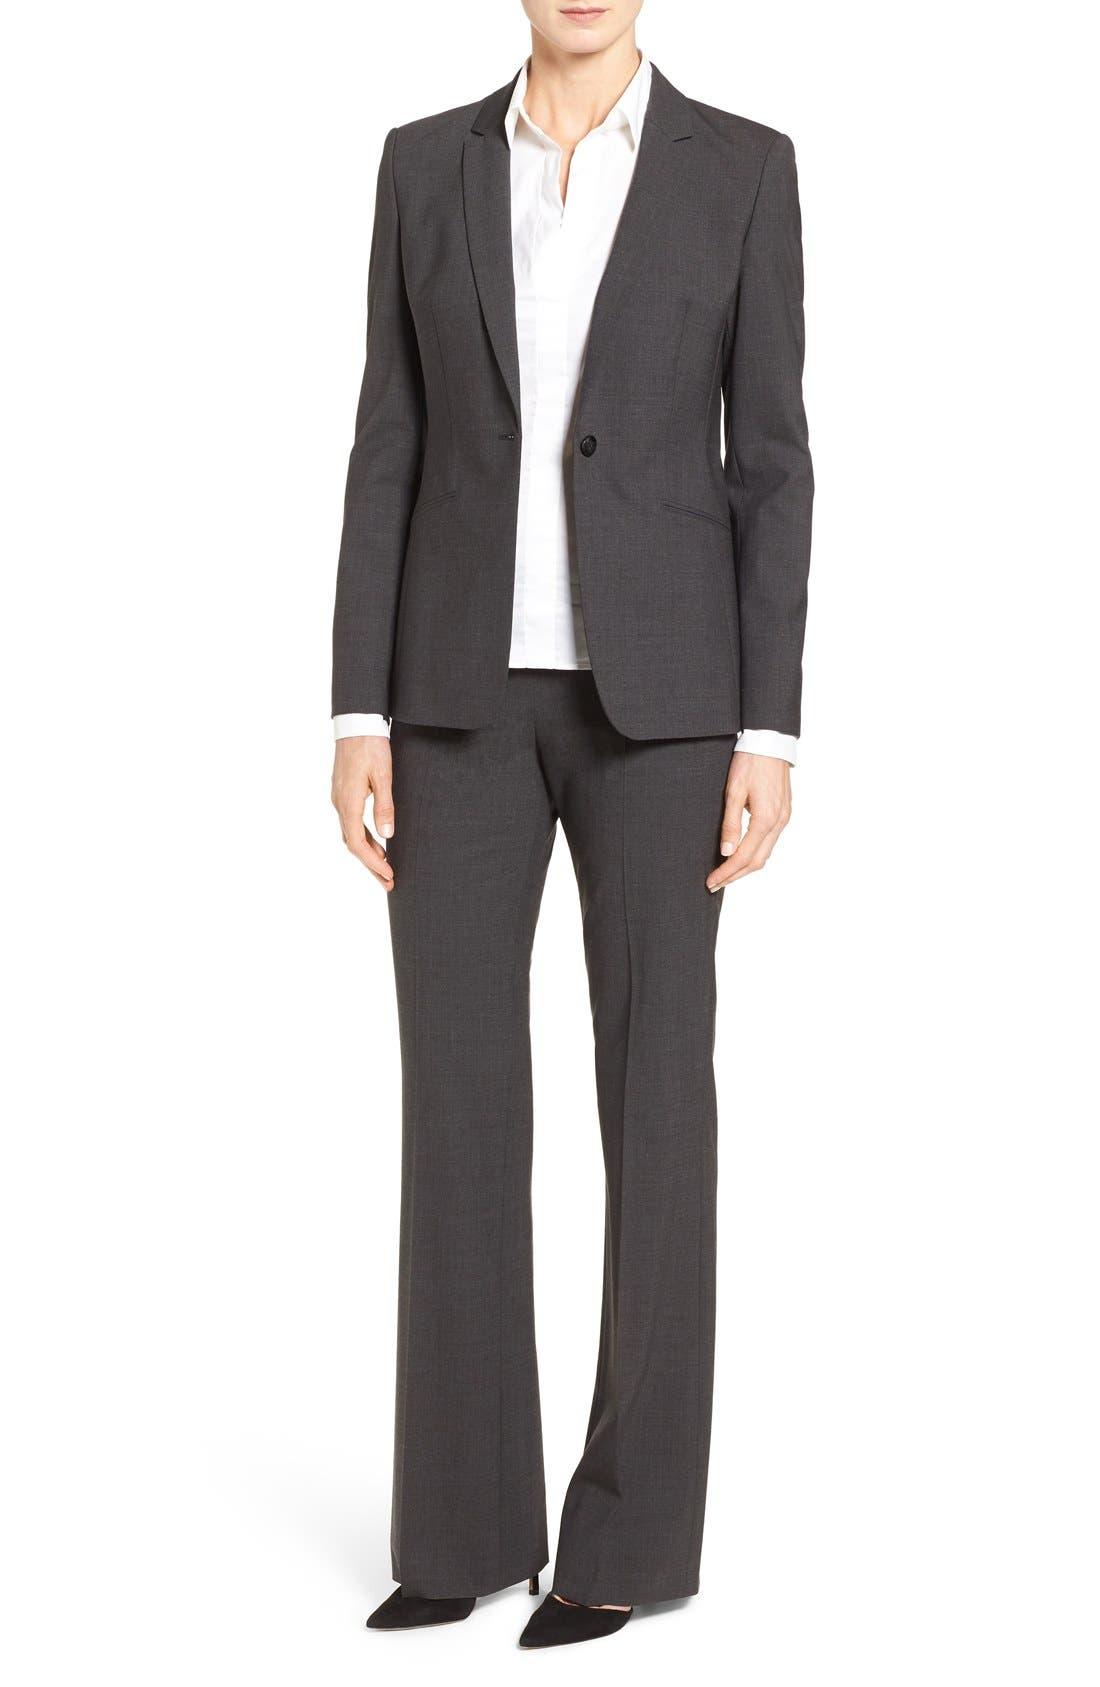 BOSS Suit Jacket, Trousers & Shirt